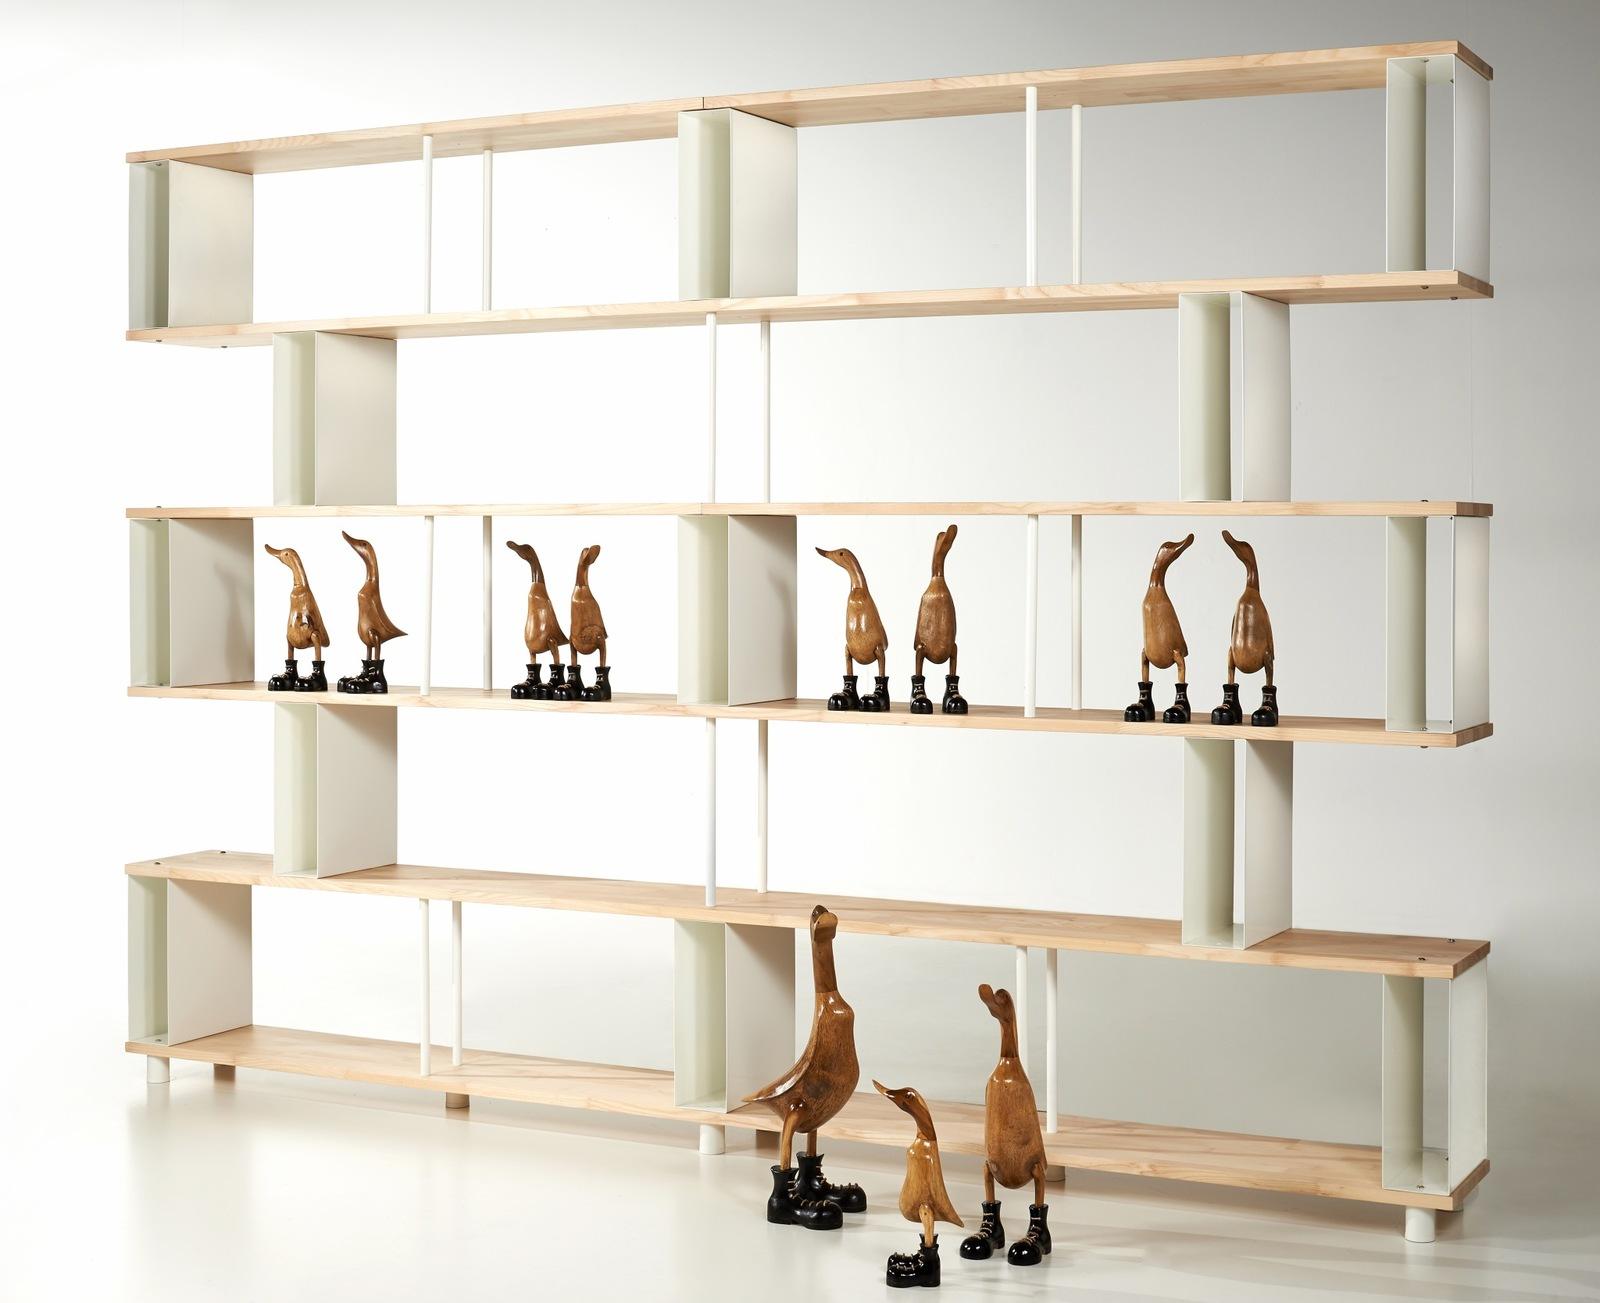 Skaffa Wood Random By Piarotto New Modular Bookcase